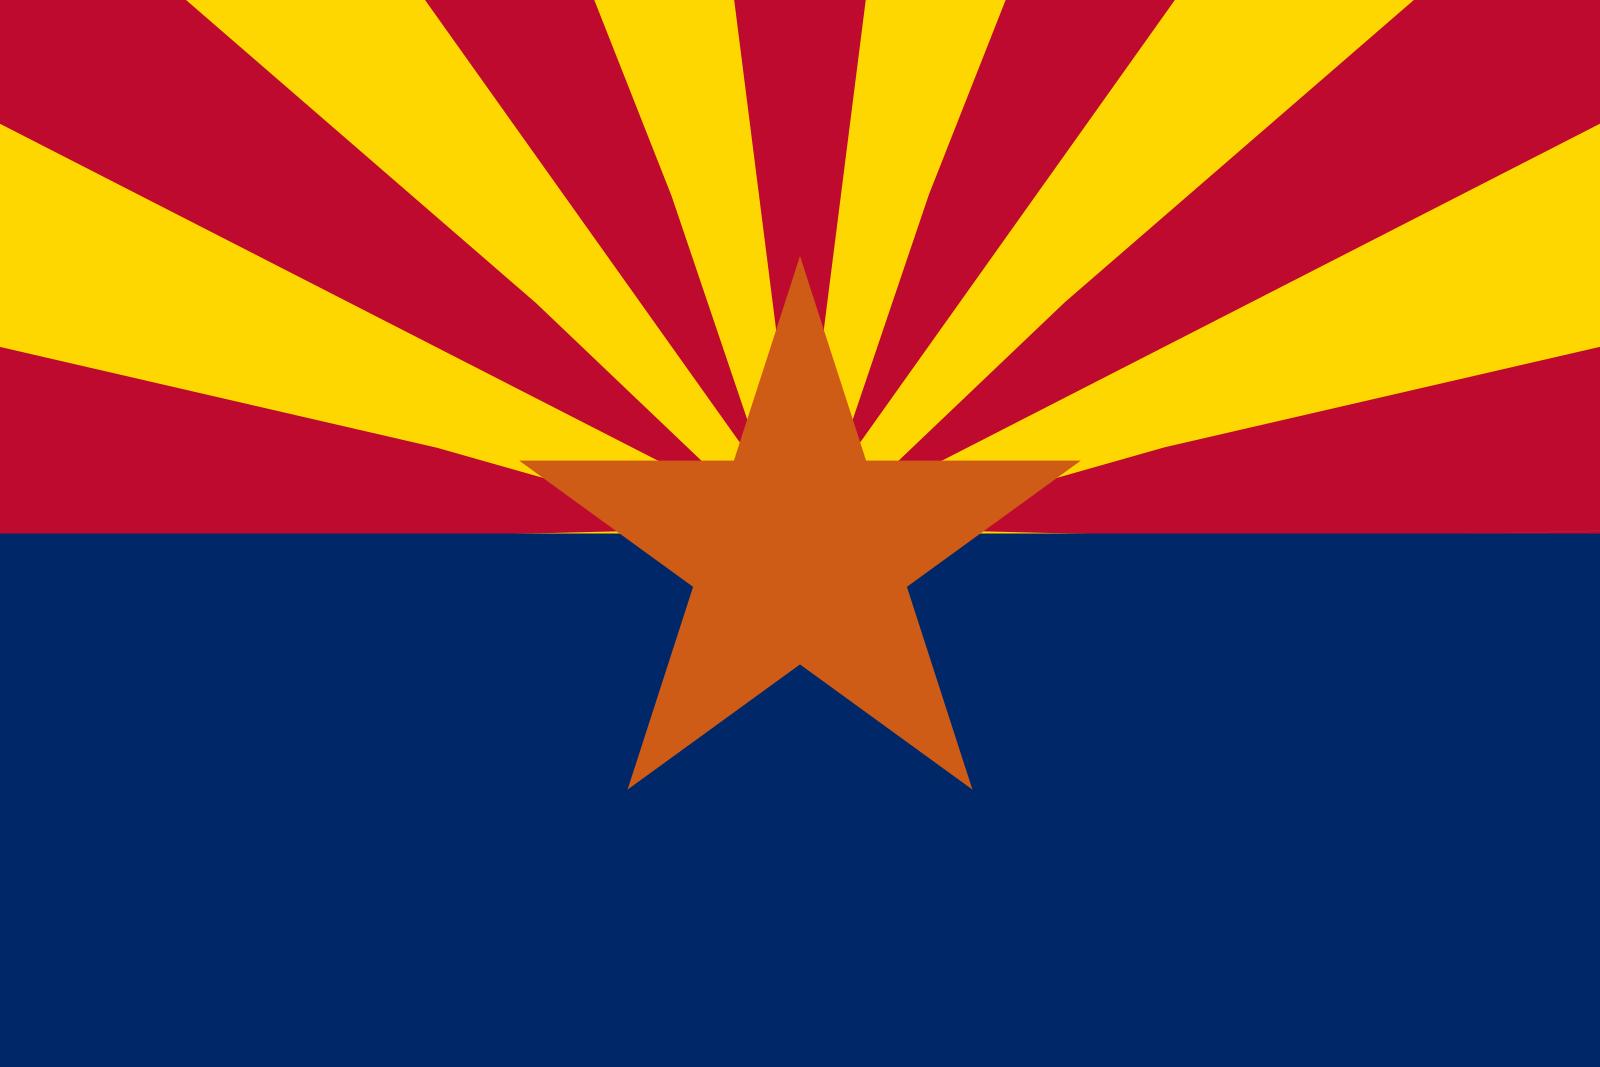 Who is the patron saint of Arizona?